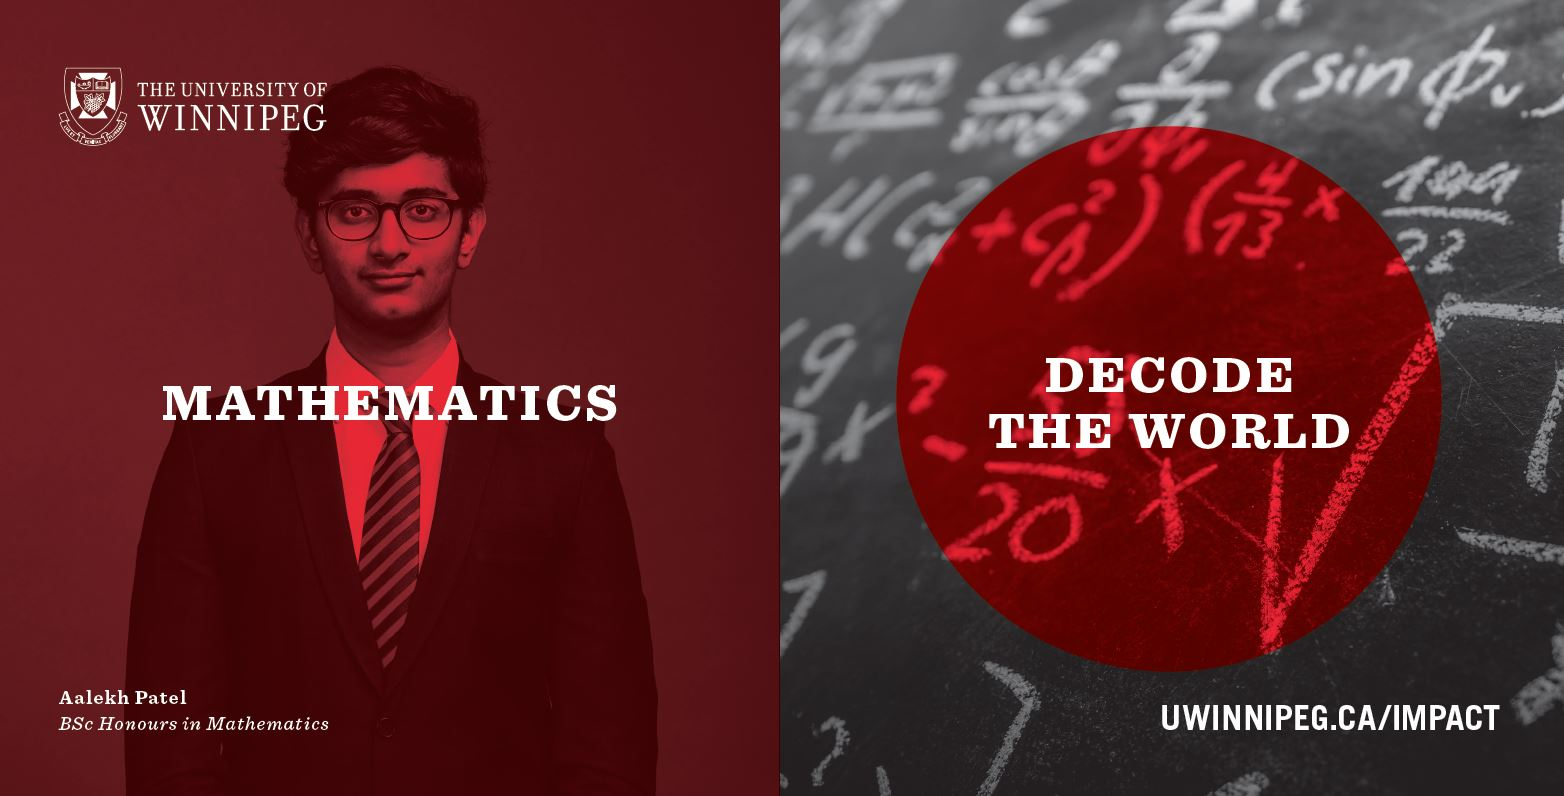 Home | Mathematics and Statistics | The University of Winnipeg